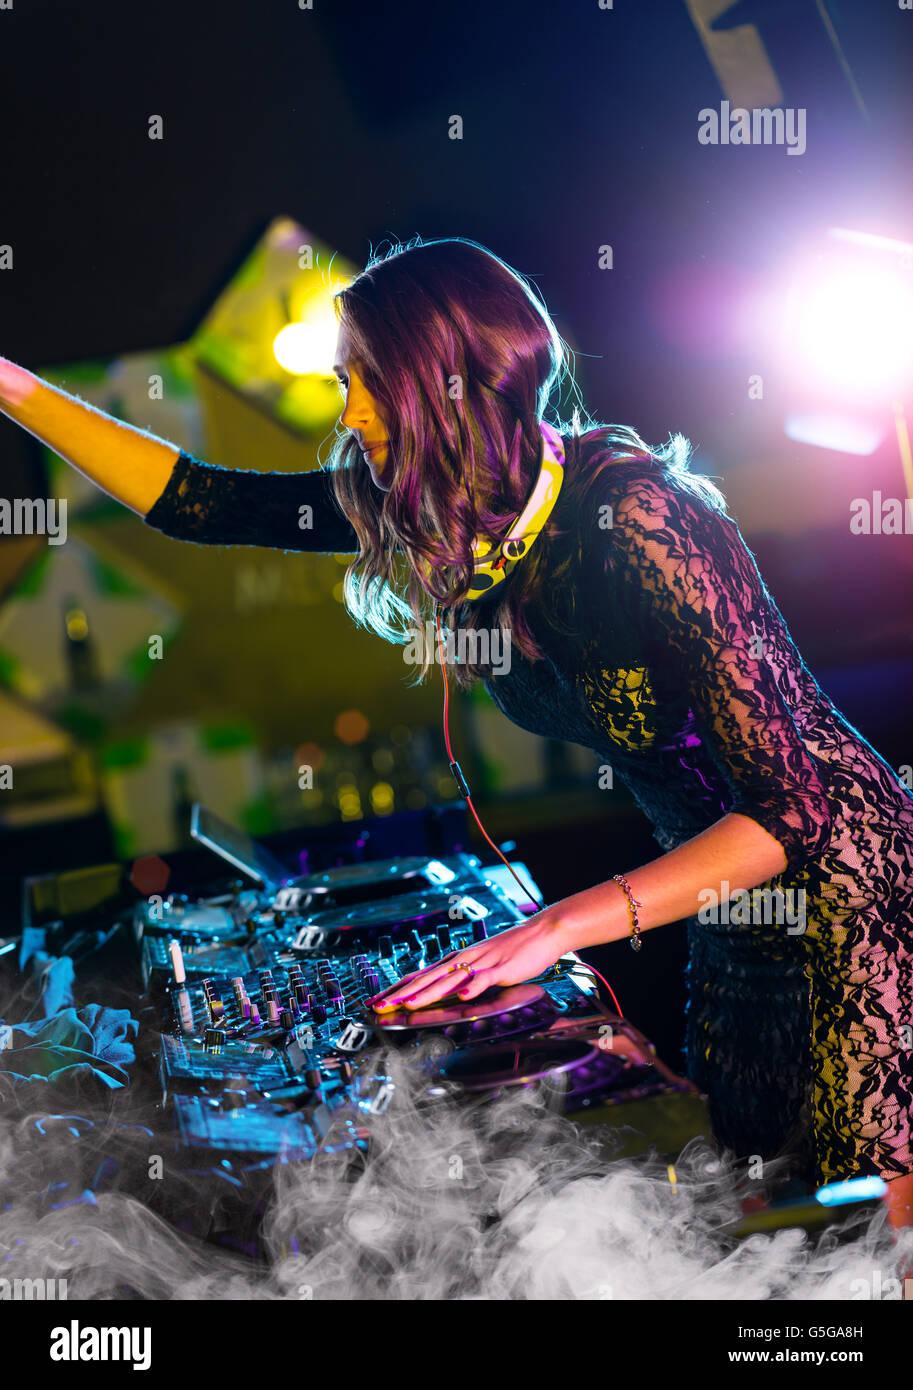 Disc jockey brunette girl miscelazione di musica elettronica nel club Immagini Stock